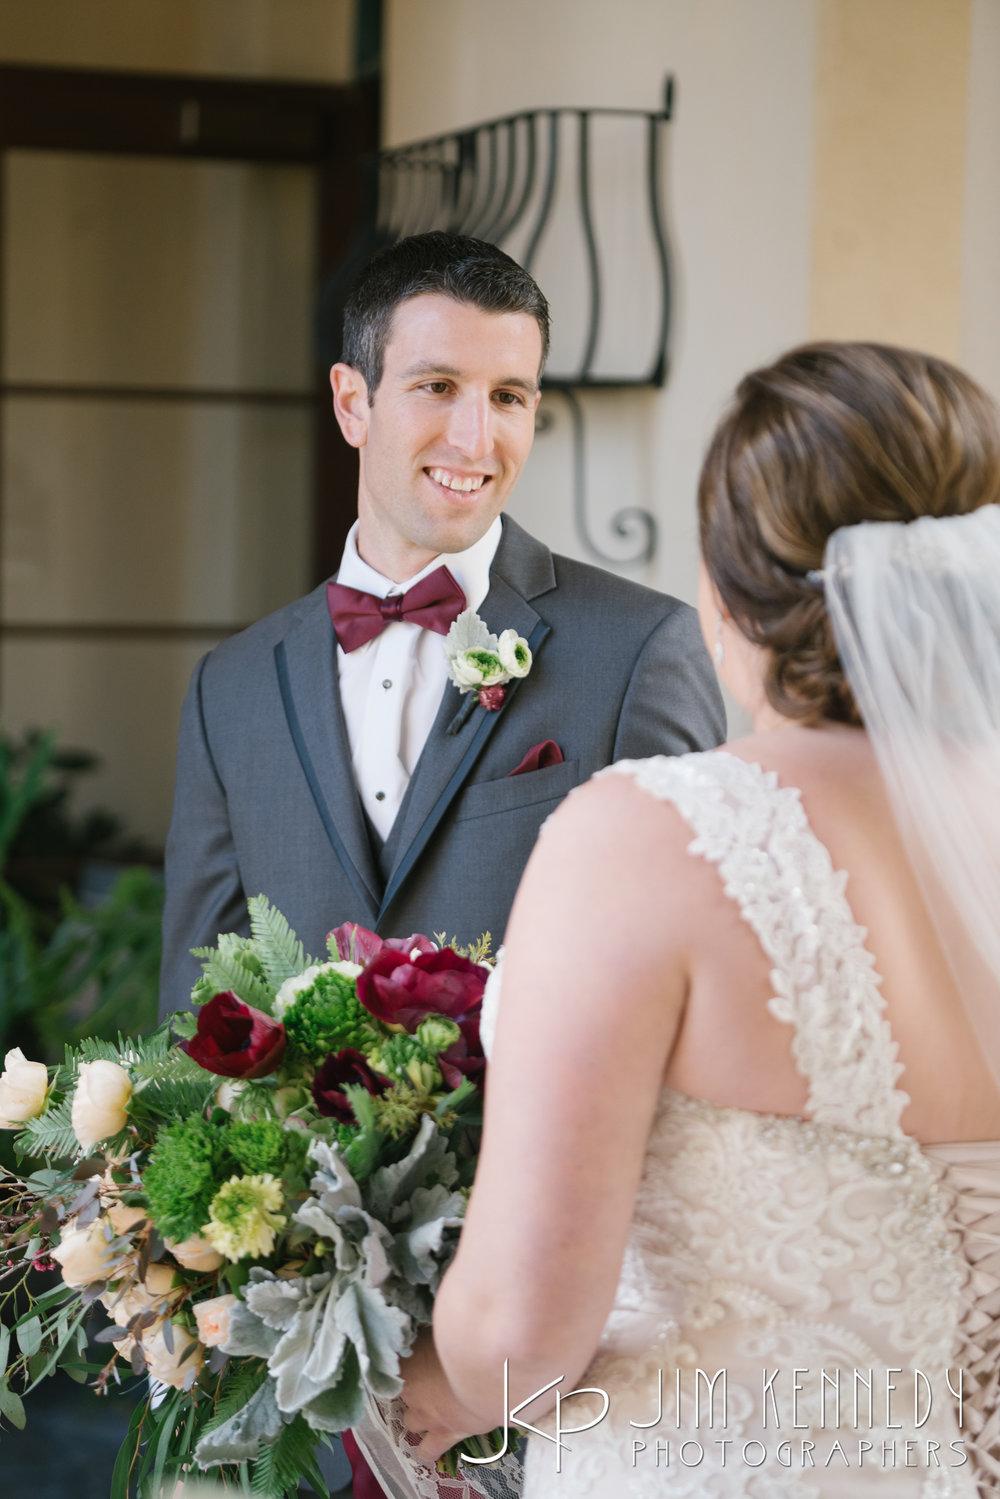 talega_wedding-0370.jpg